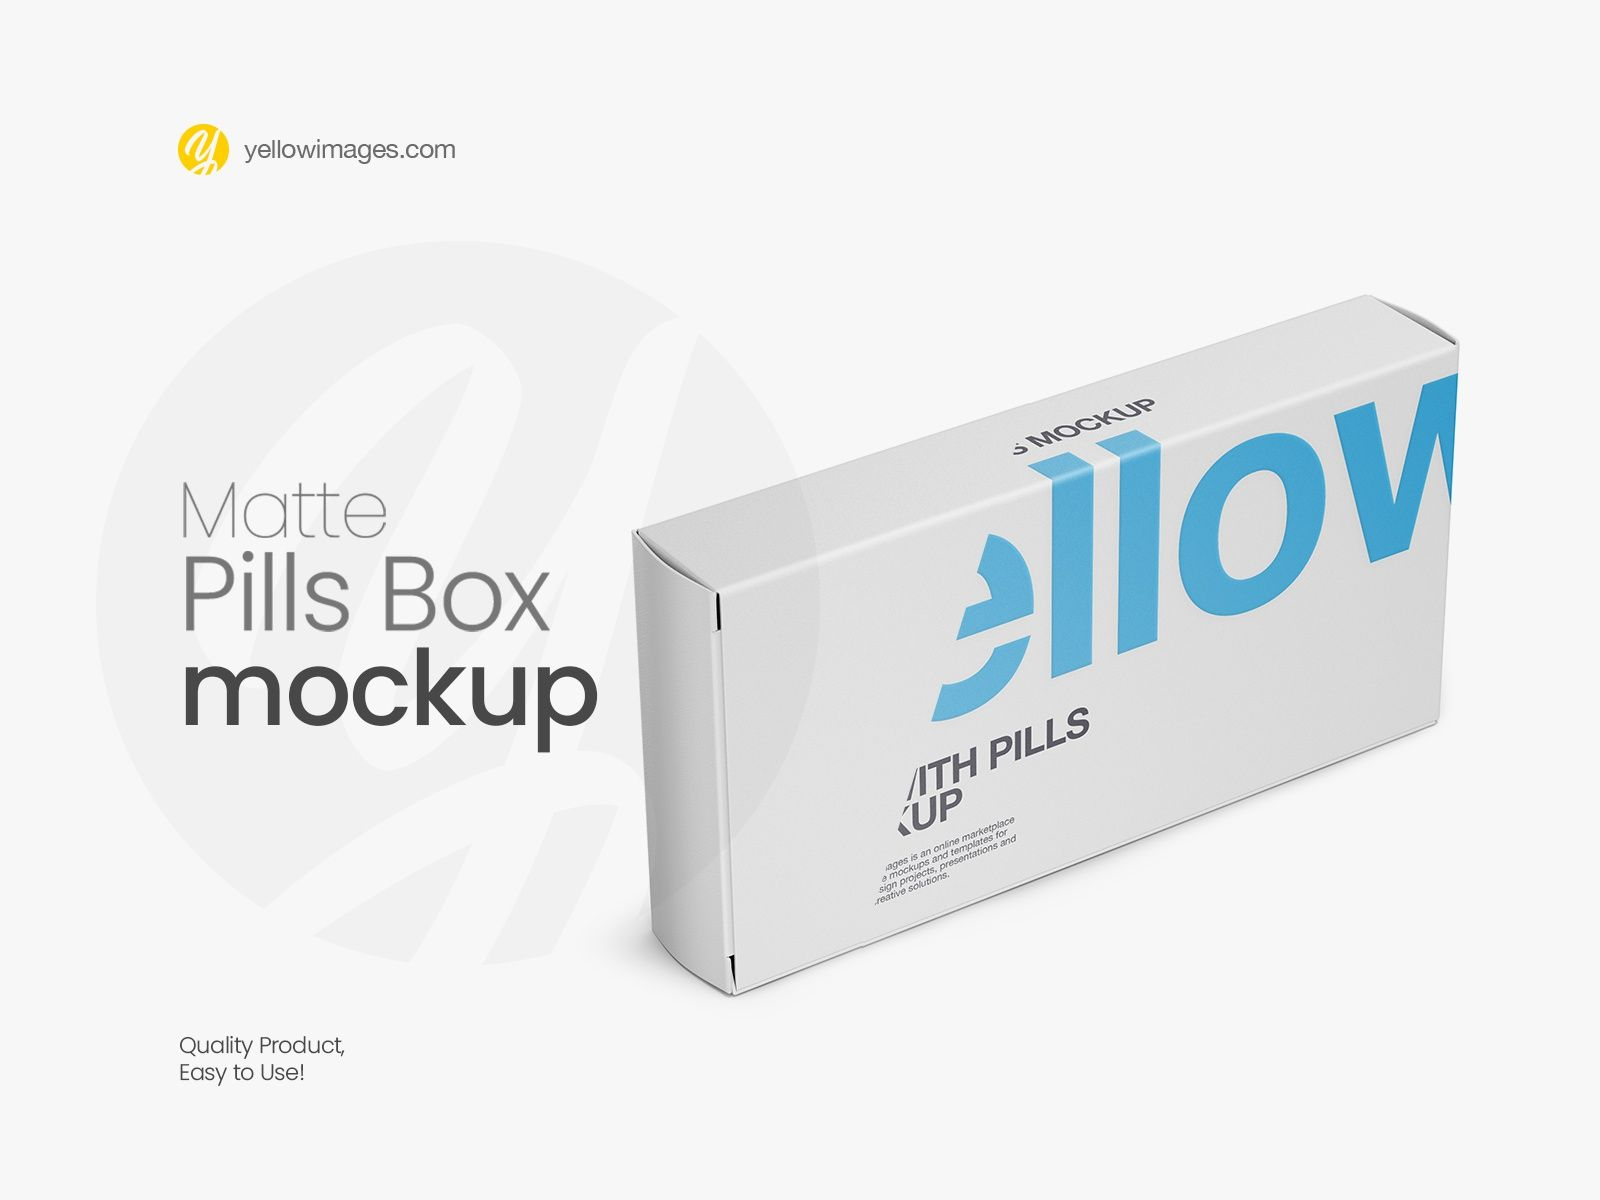 Download Matte Pills Box Mockup Halfside View In 2020 Box Mockup Pills Mockup PSD Mockup Templates